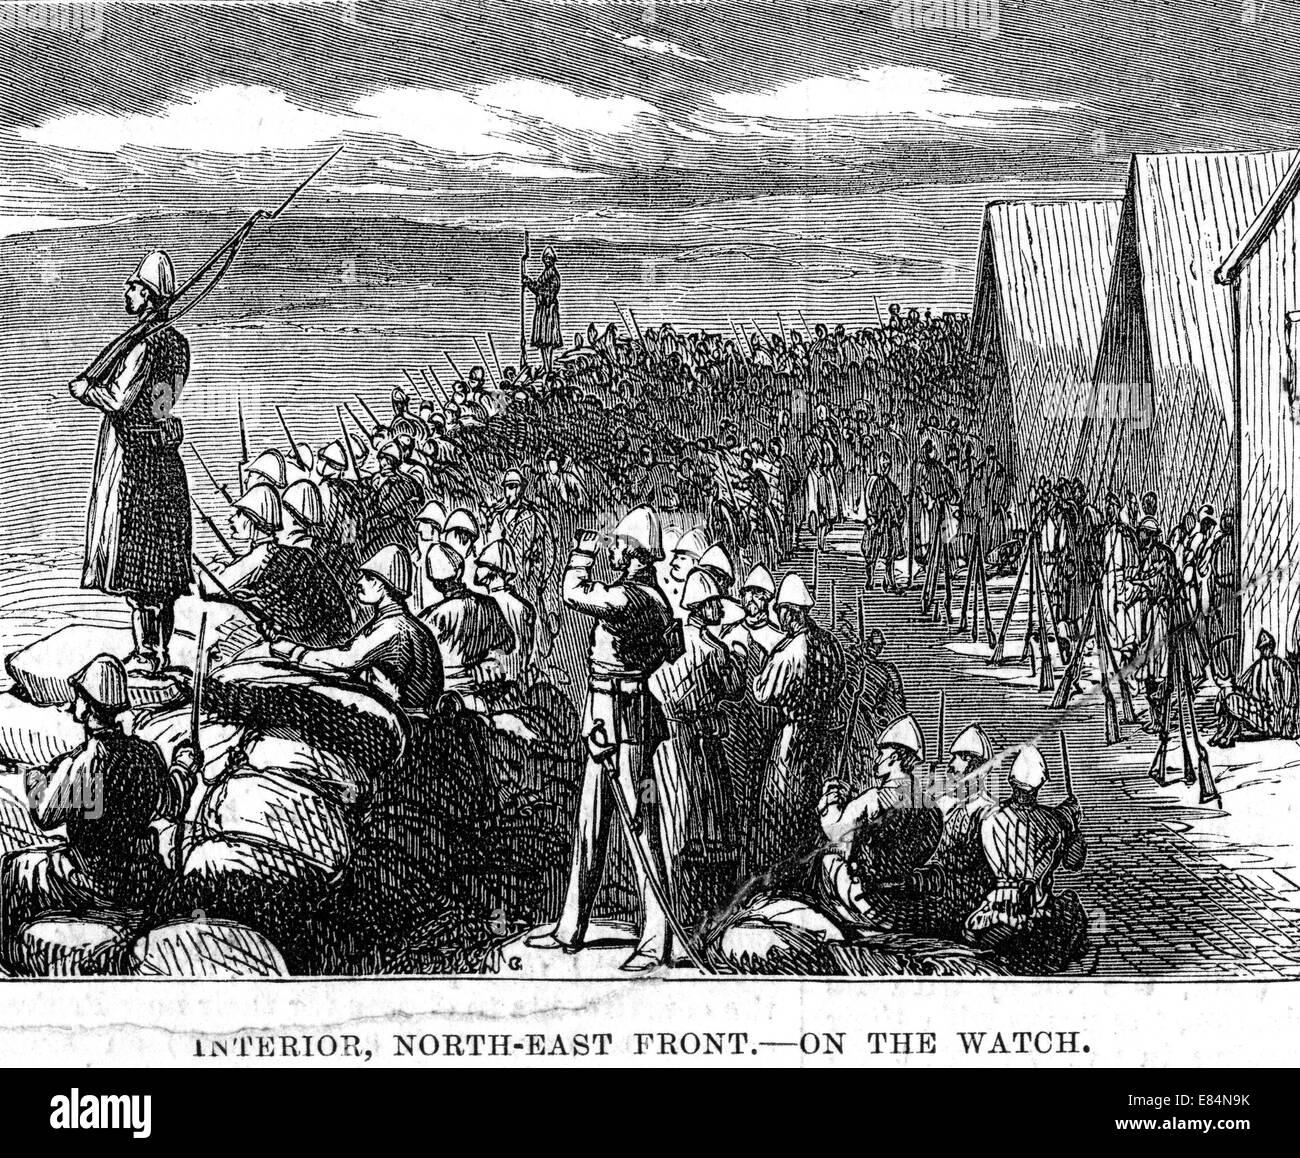 ZULU WAR 1879 Helpmakaar camp on the alert - Stock Image